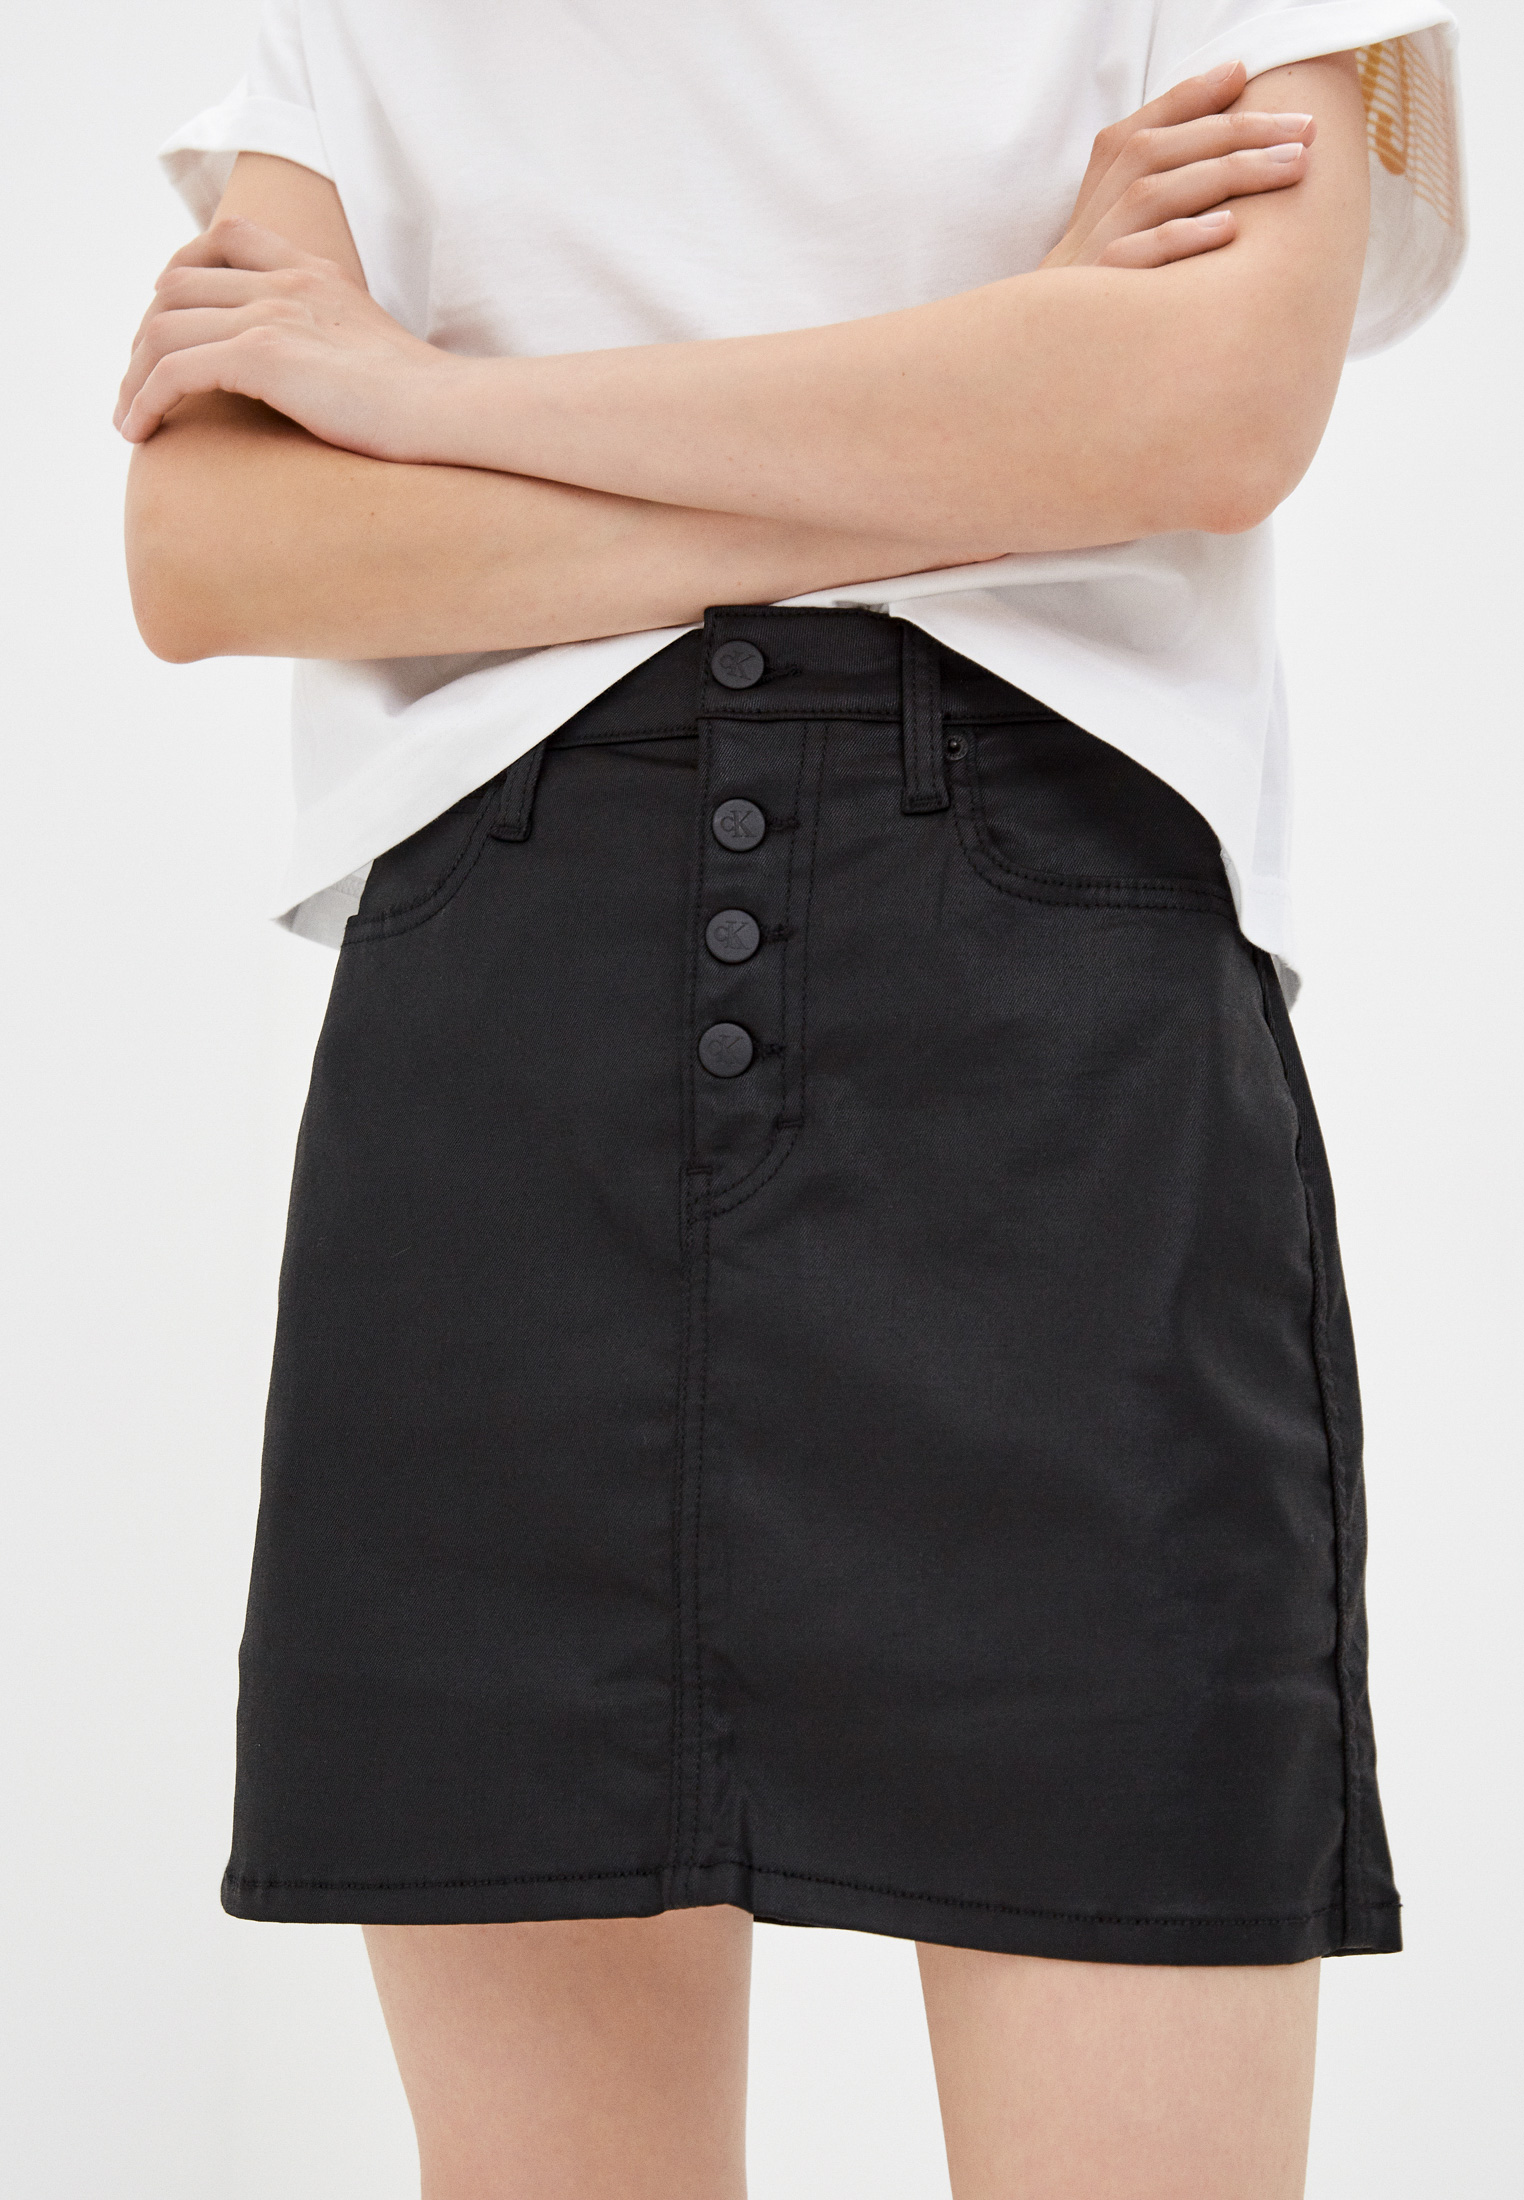 Джинсовая юбка Calvin Klein Jeans Юбка джинсовая Calvin Klein Jeans